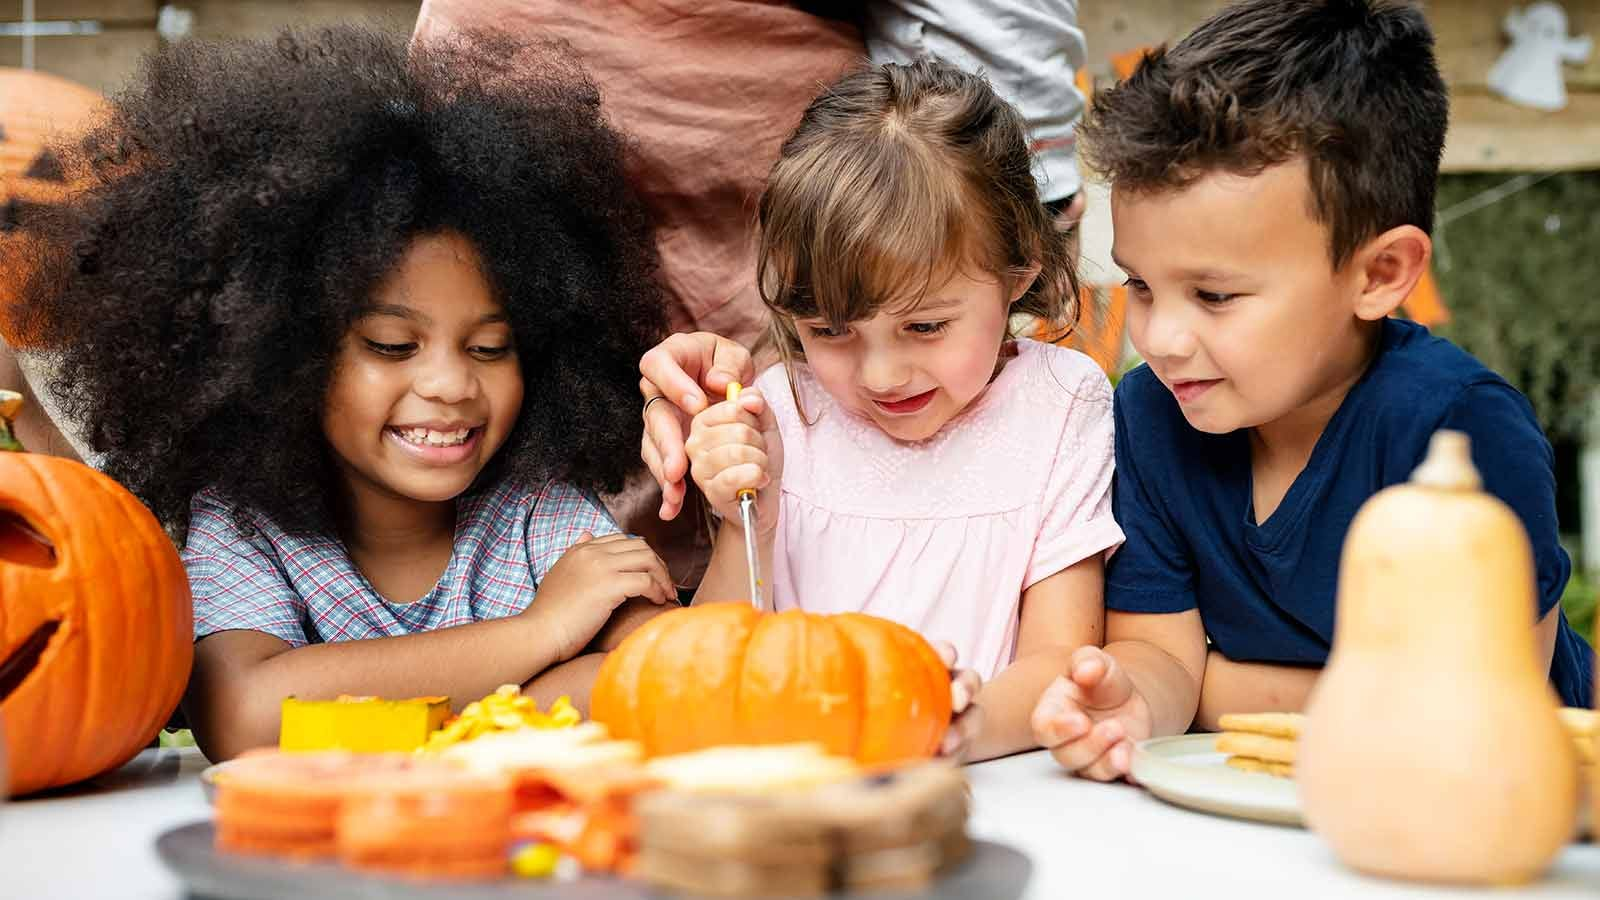 Three children at a table carving a pumpkin.